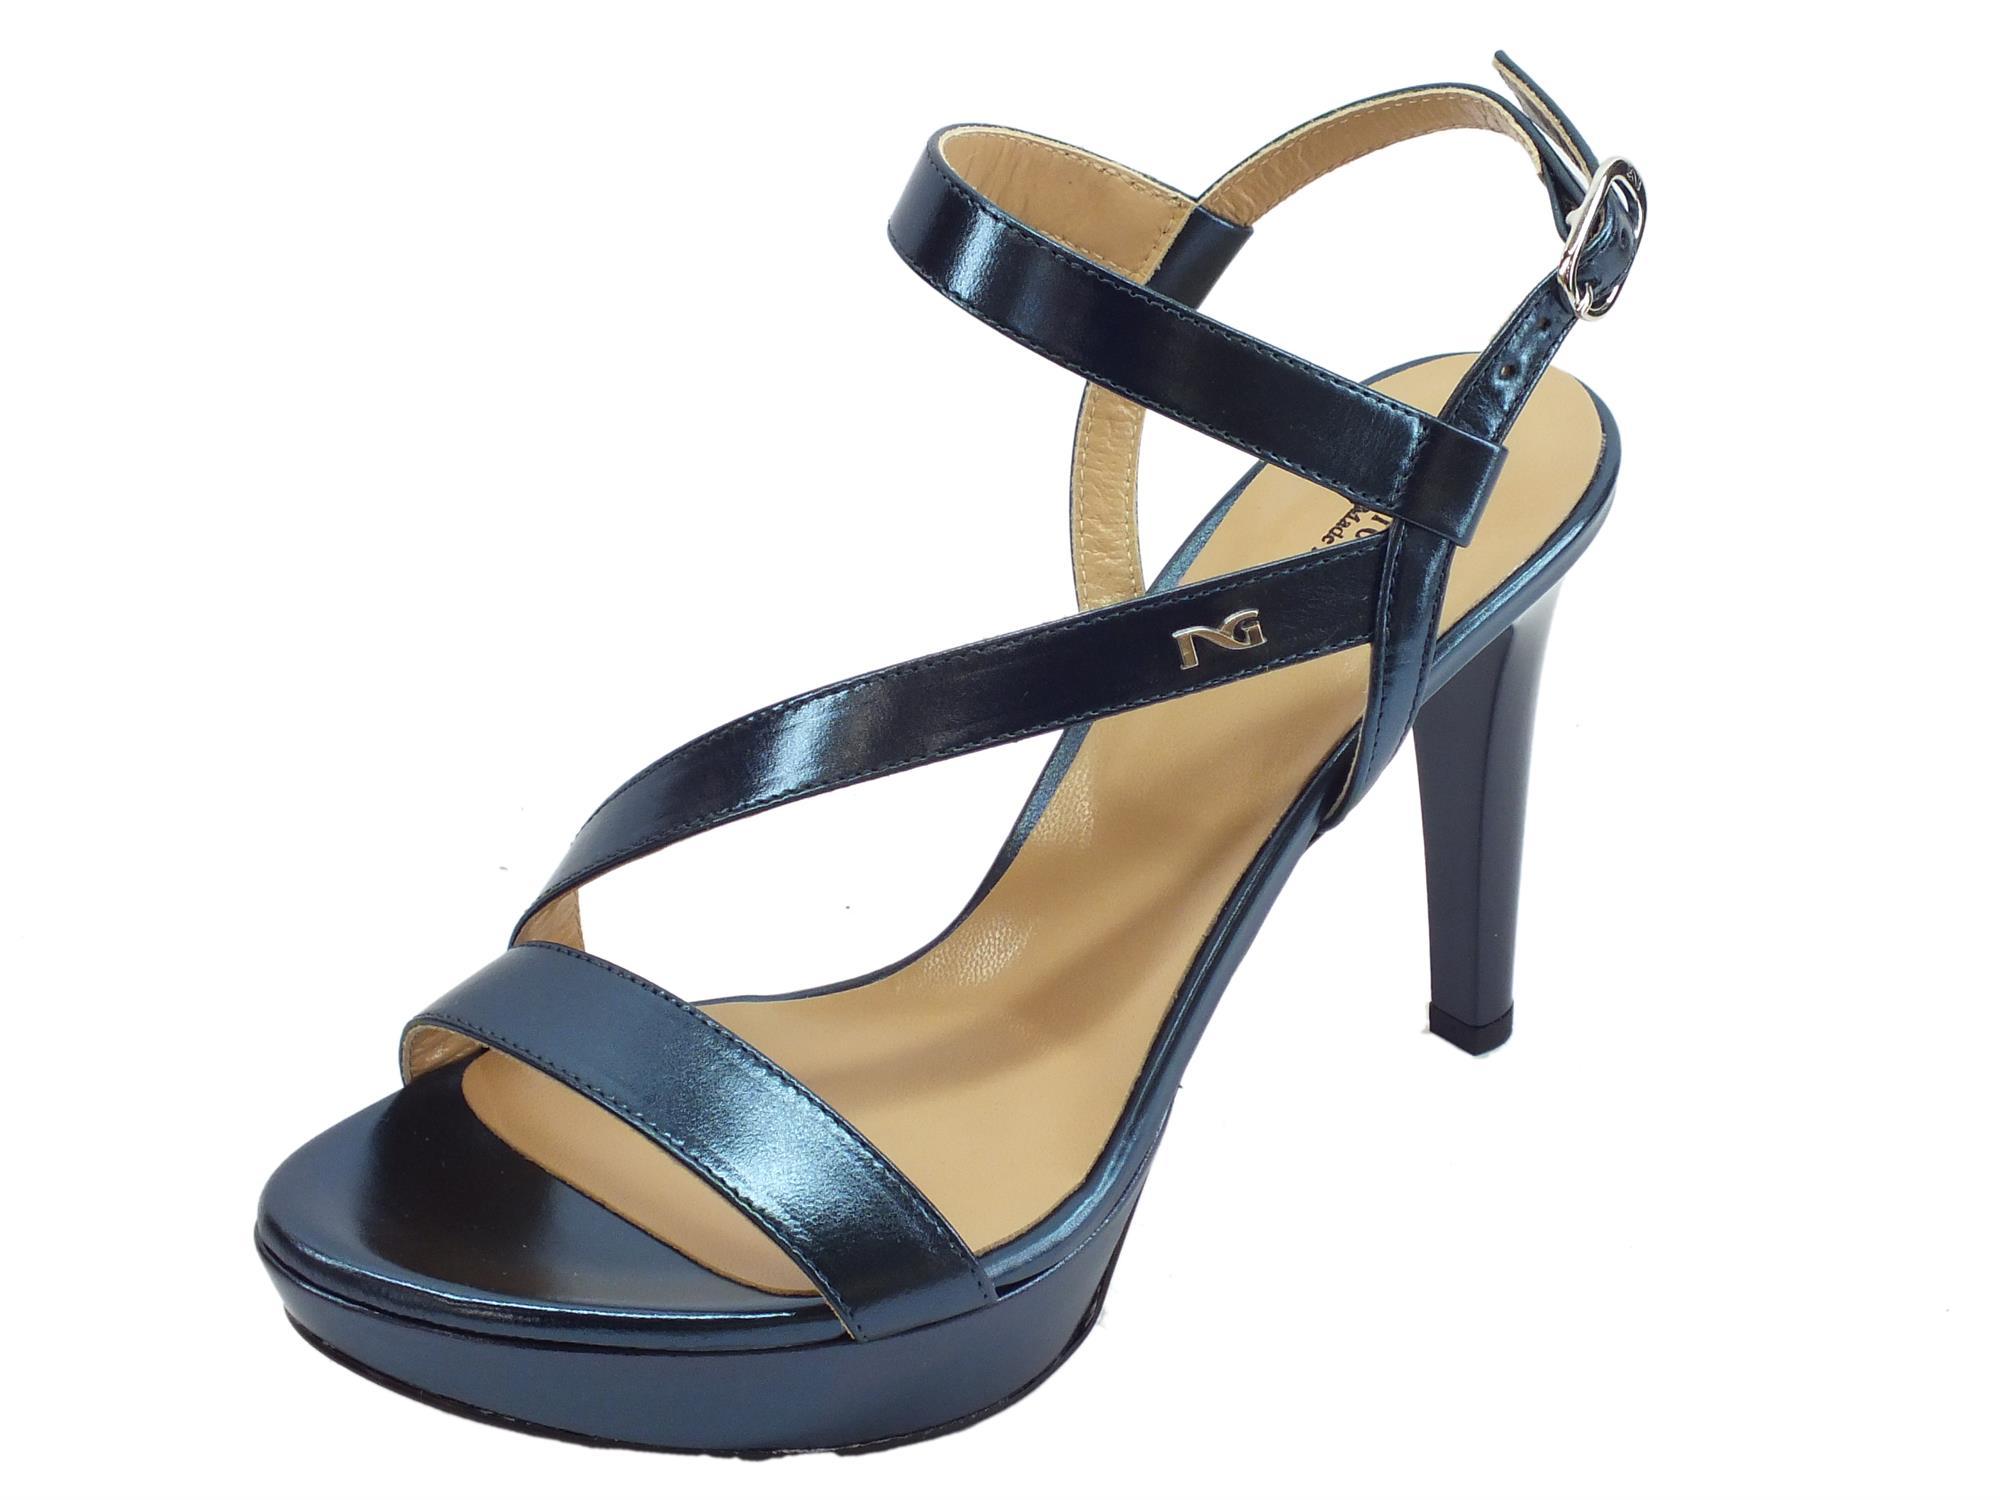 2b53743154faab NeroGiardini P908472DE Laminato Oceano sandali eleganti tacco alto in pelle  laminato blu